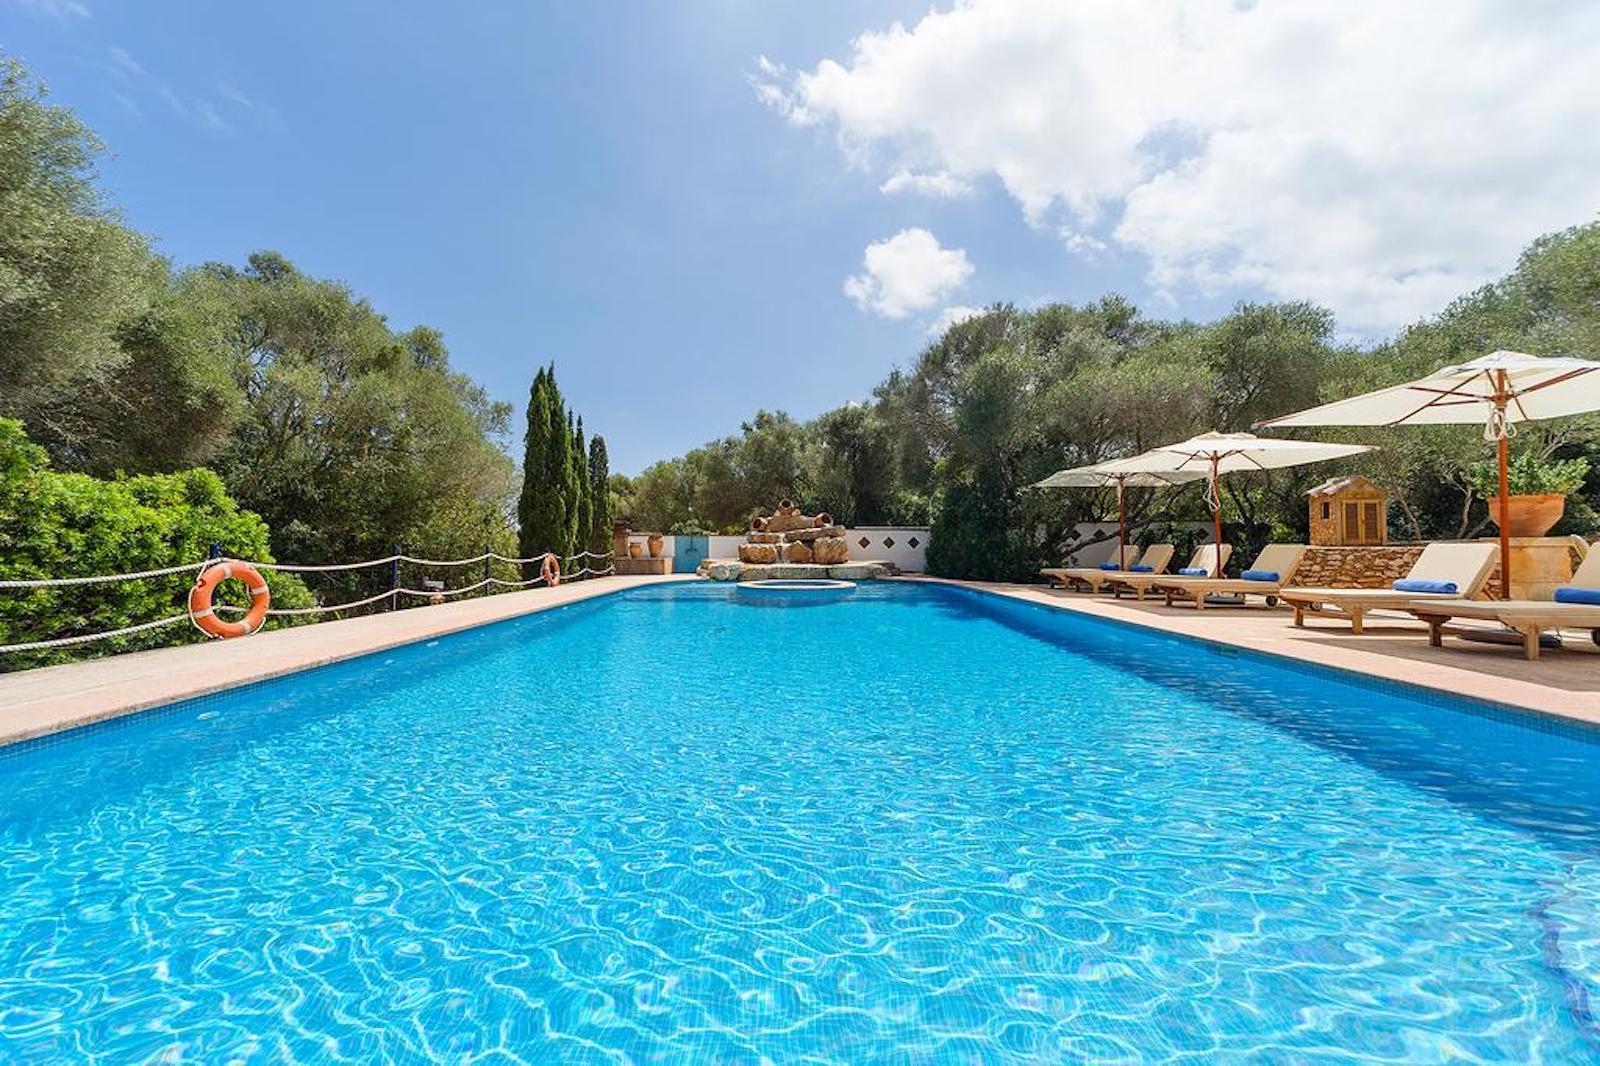 ISLA-Travel-Finca-Hotel-Mallorca-Pool -mit-Liegen